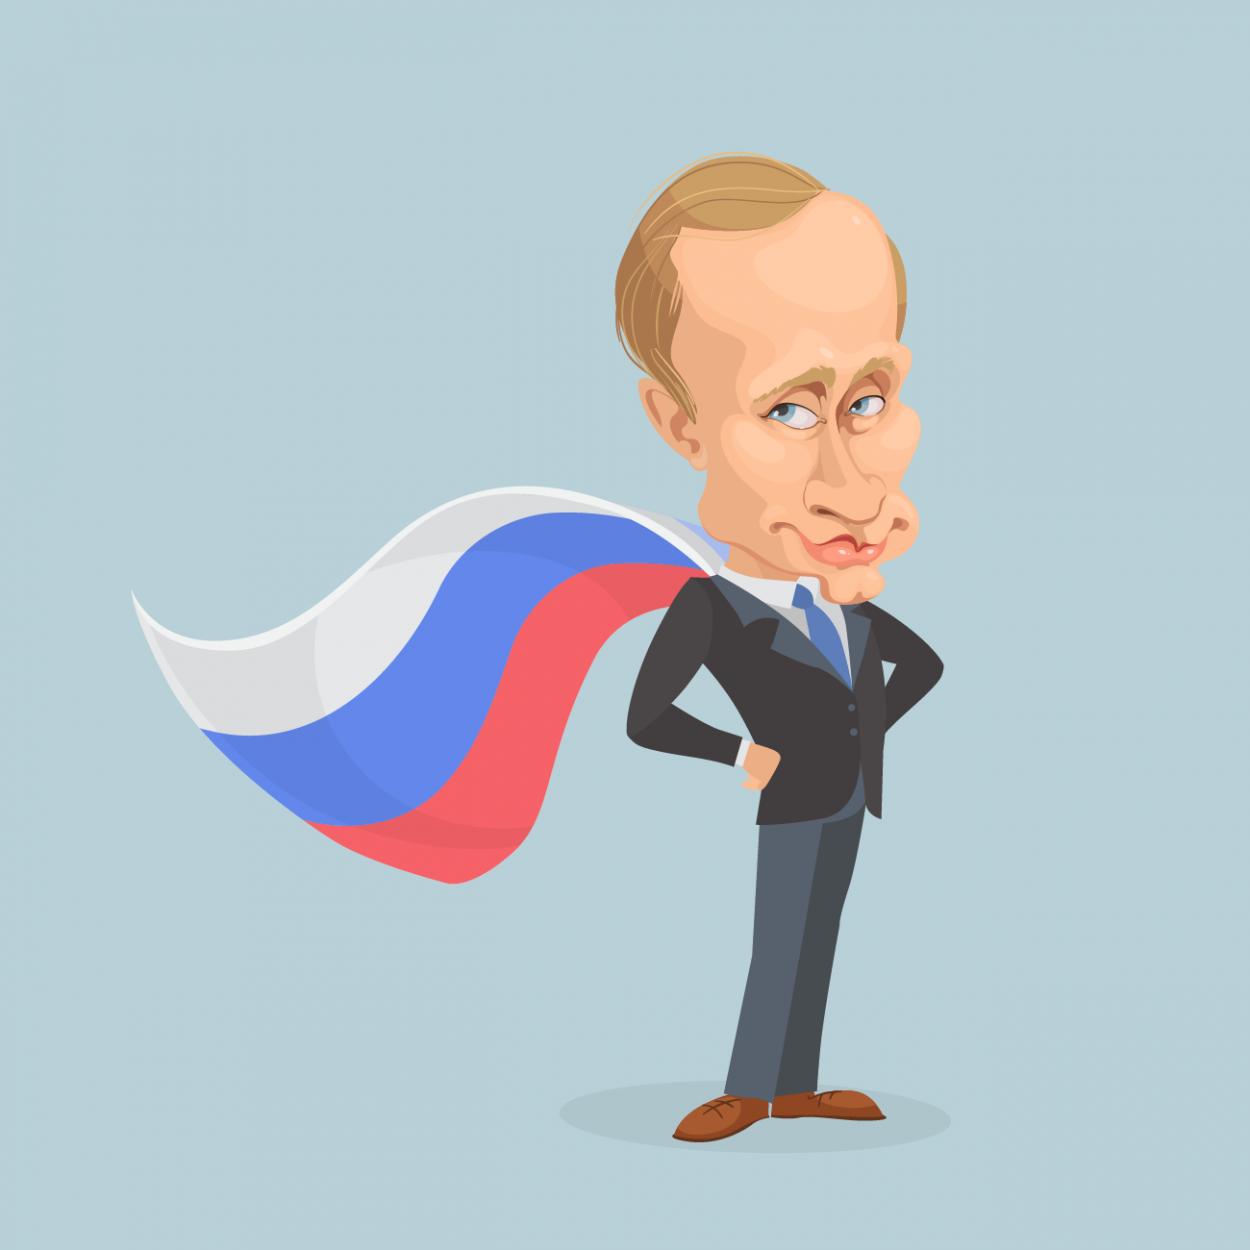 Анекдот про помощь Путина Джорджу Бушу